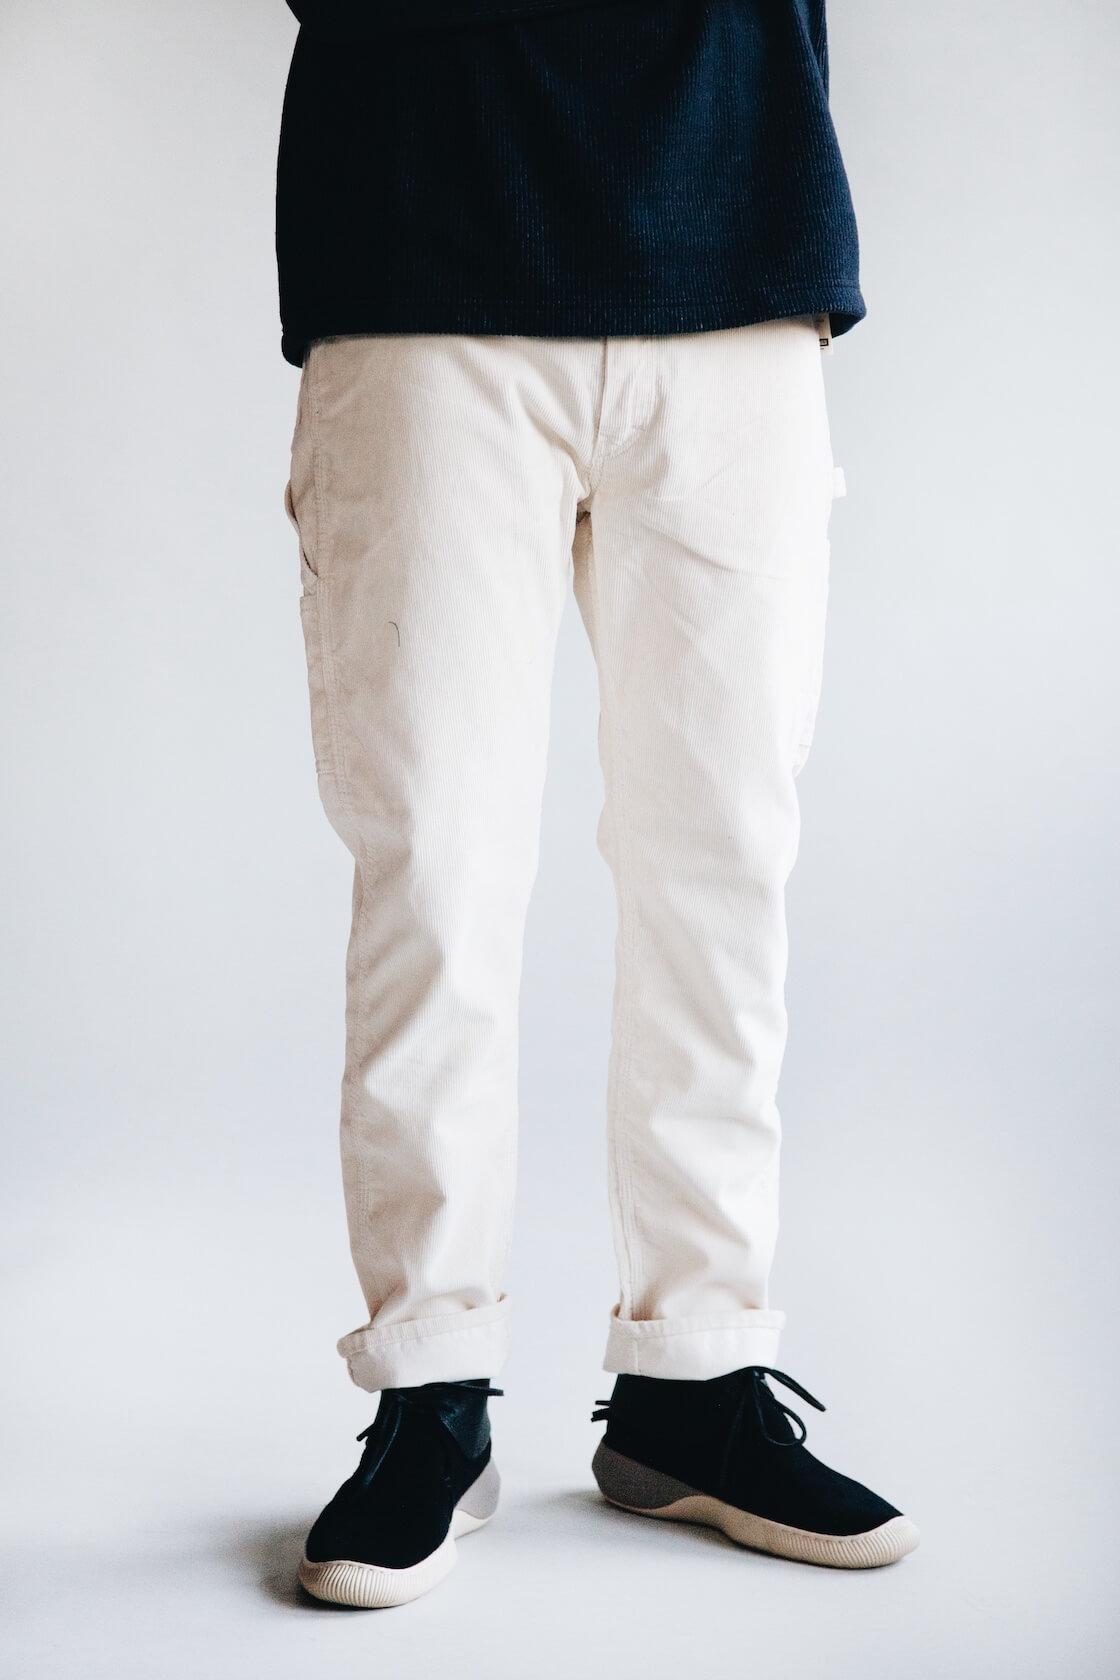 tss raglan sleeve crewneck shirt and orslow canoe club painter pants and visvim shoes on body